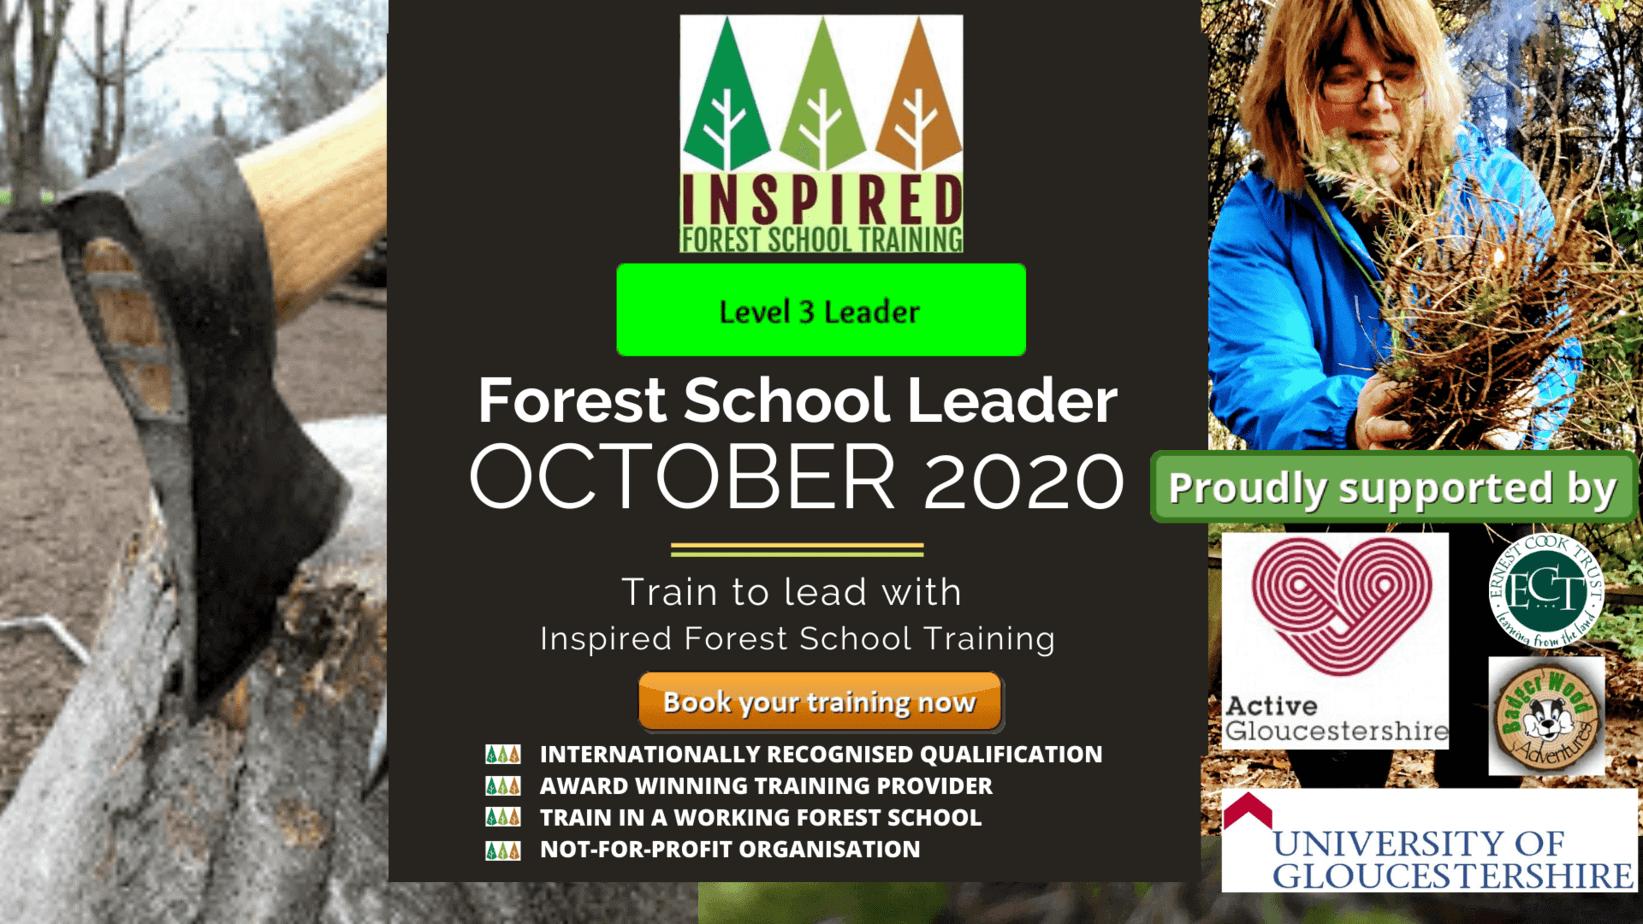 October-2020-Forest-School-Leader Level 3 Forest School Training - October 2020